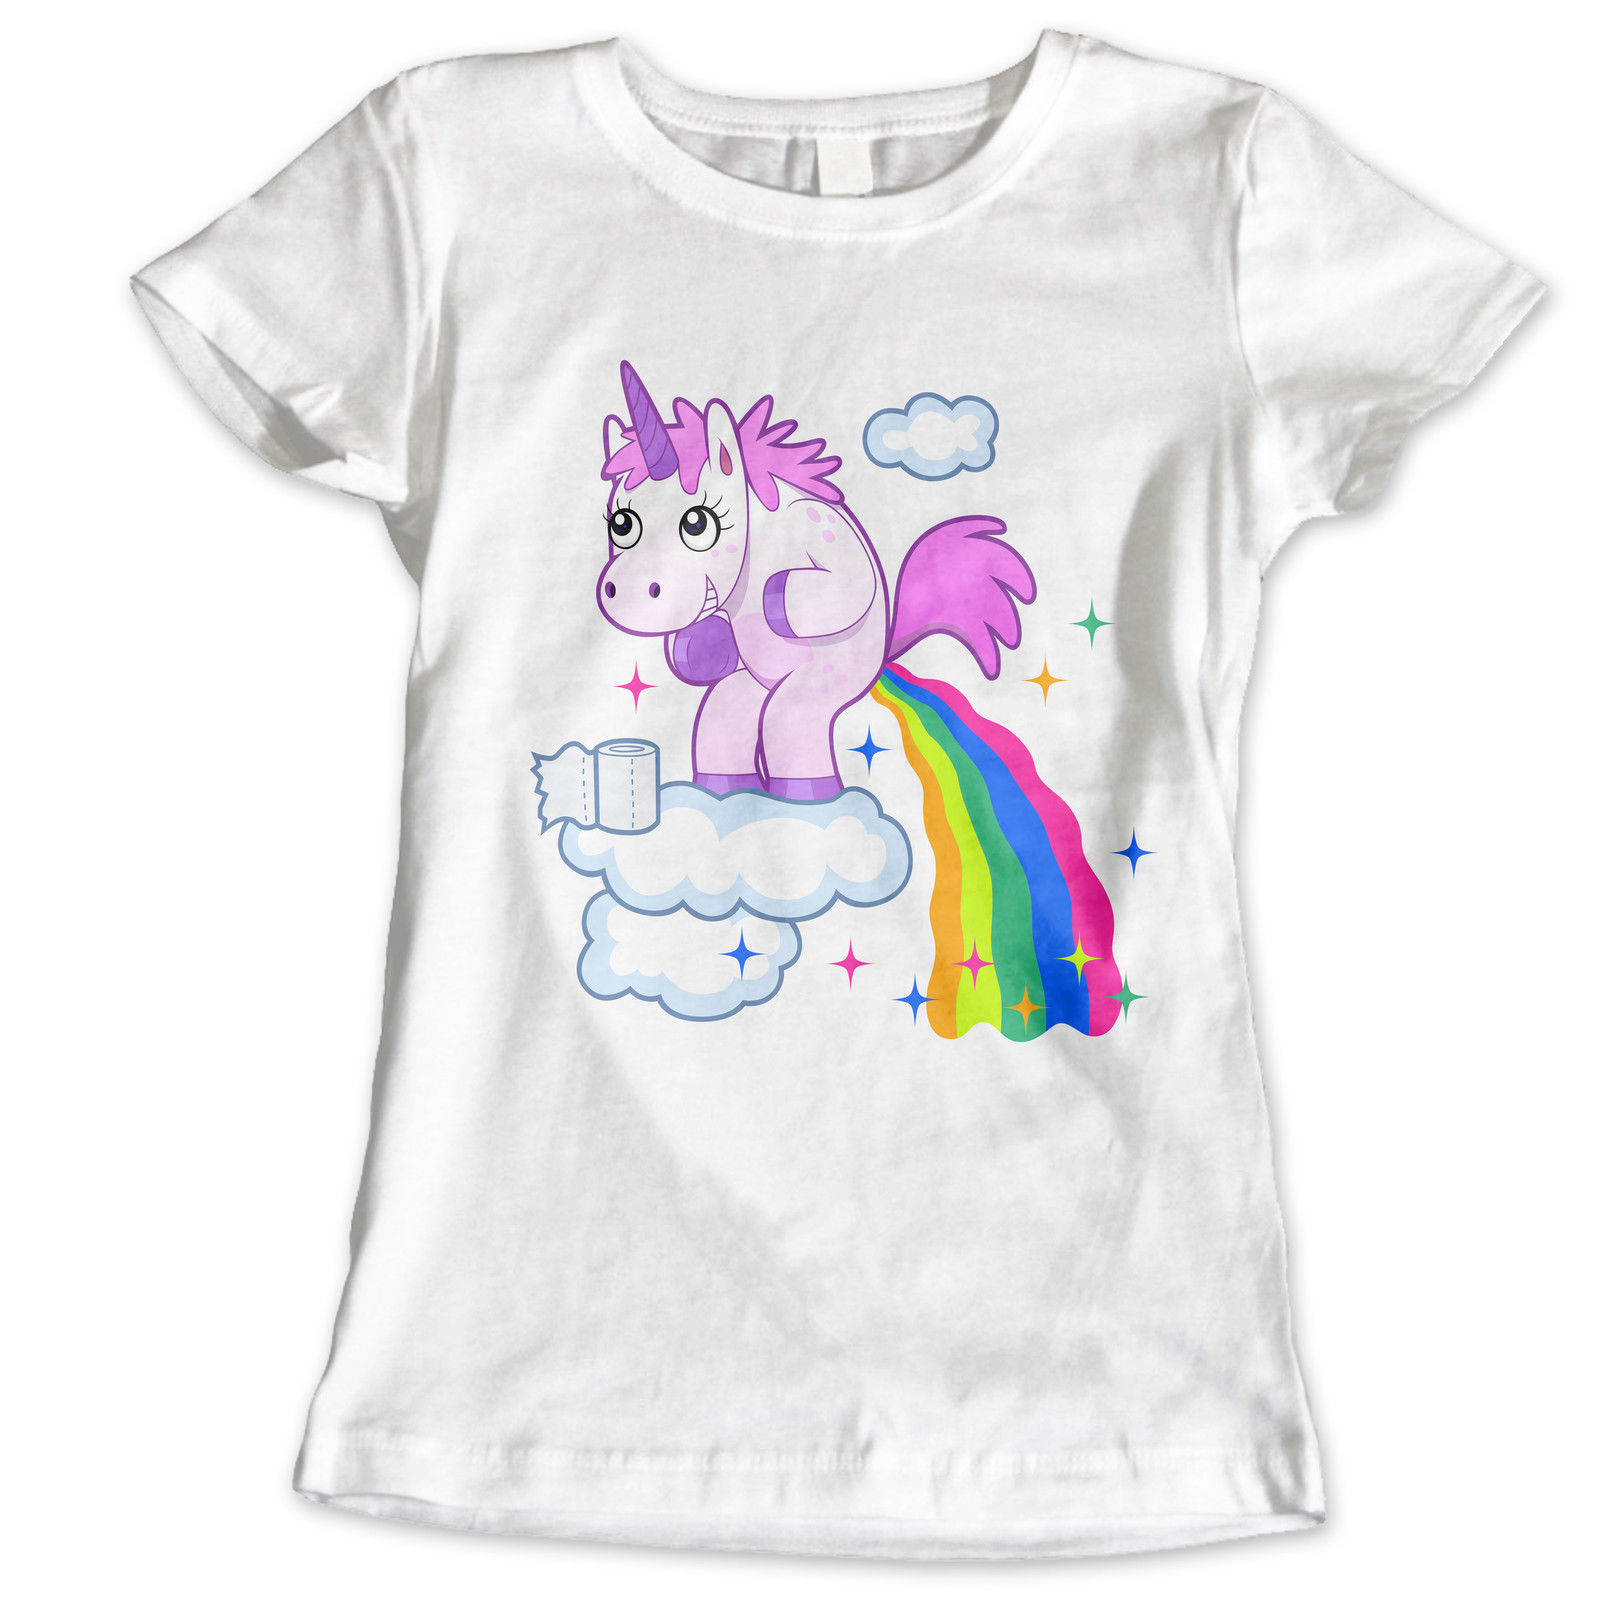 girls womans unicorn celebrity girly princess tumblr